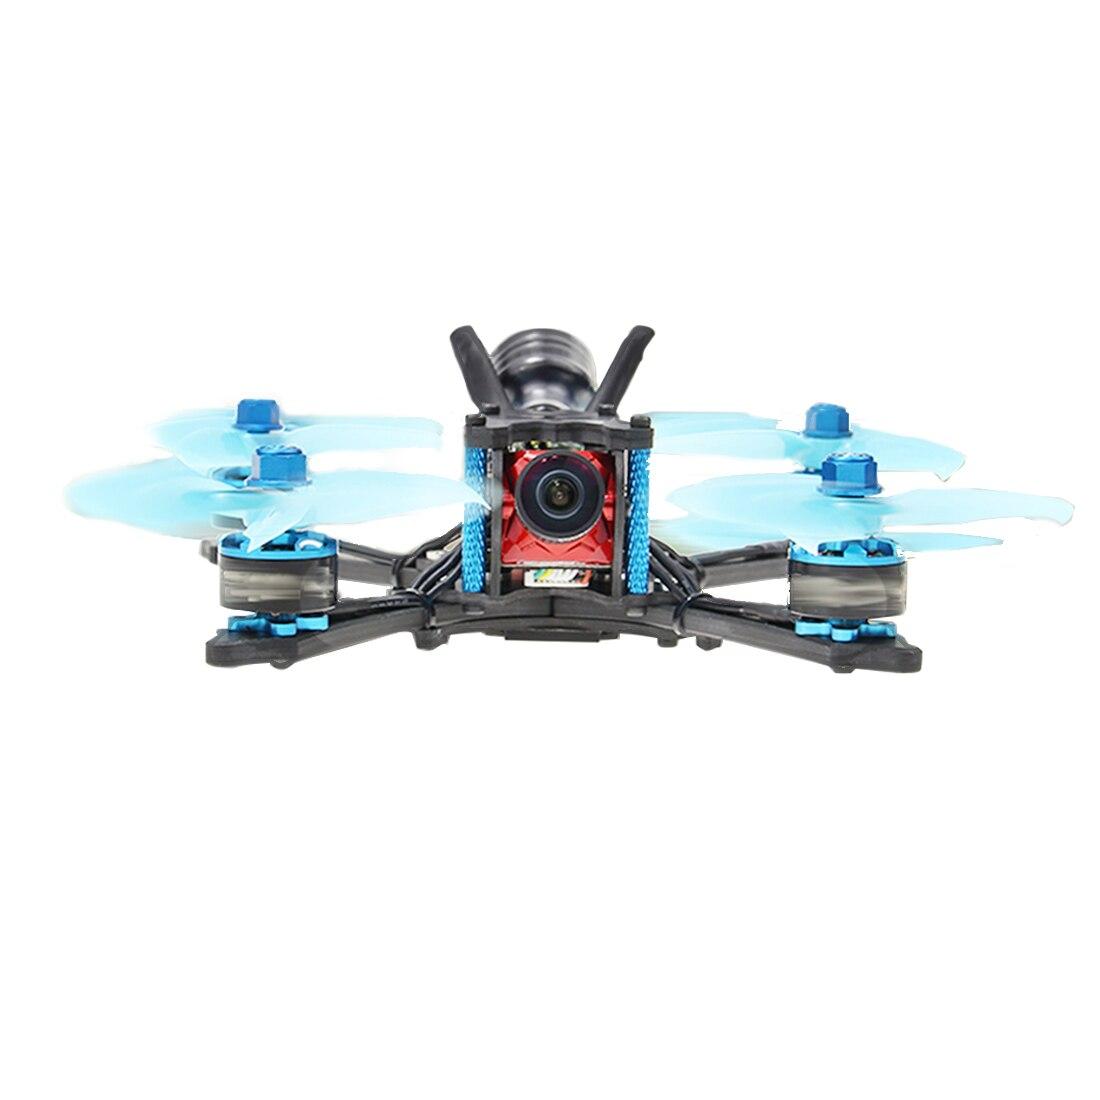 HGLRC Arrow3 152mm 3 Inch F4 OSD 4S / 6S Mini FPV Racing Drone PNP BNF with 45A ESC Caddx Ratel 1200TVL Camera RC Quadcopter - 2